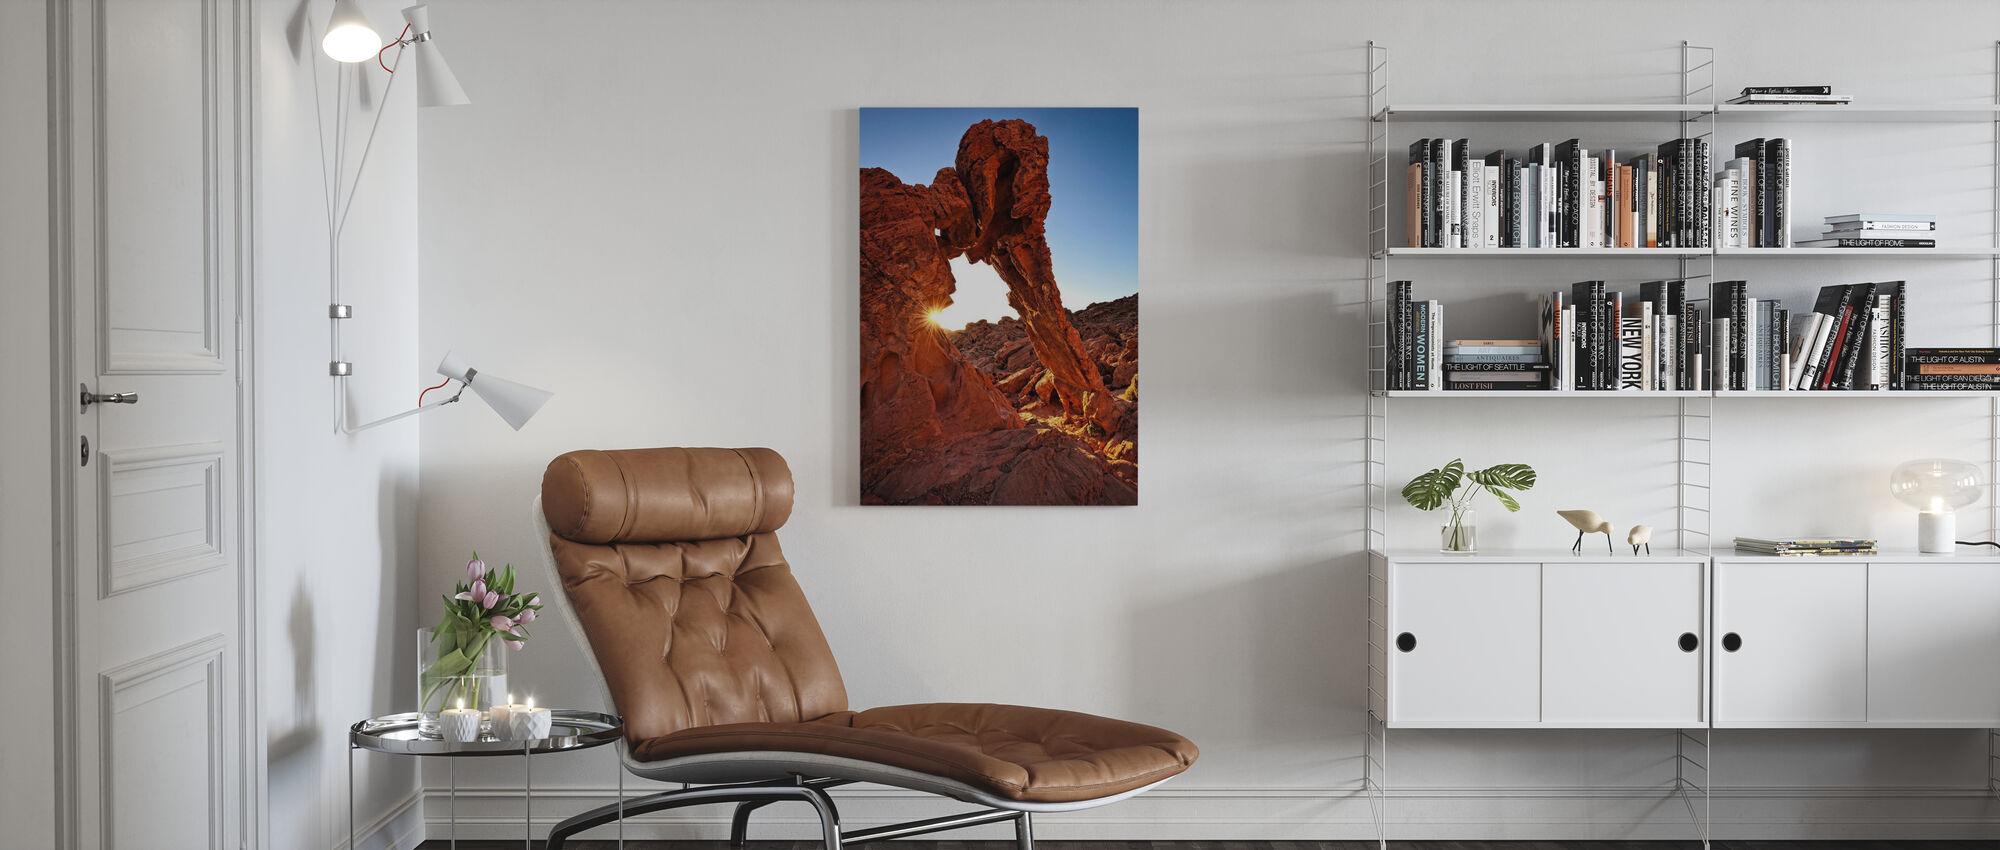 Olifant Rock in de Vuurvallei - Canvas print - Woonkamer